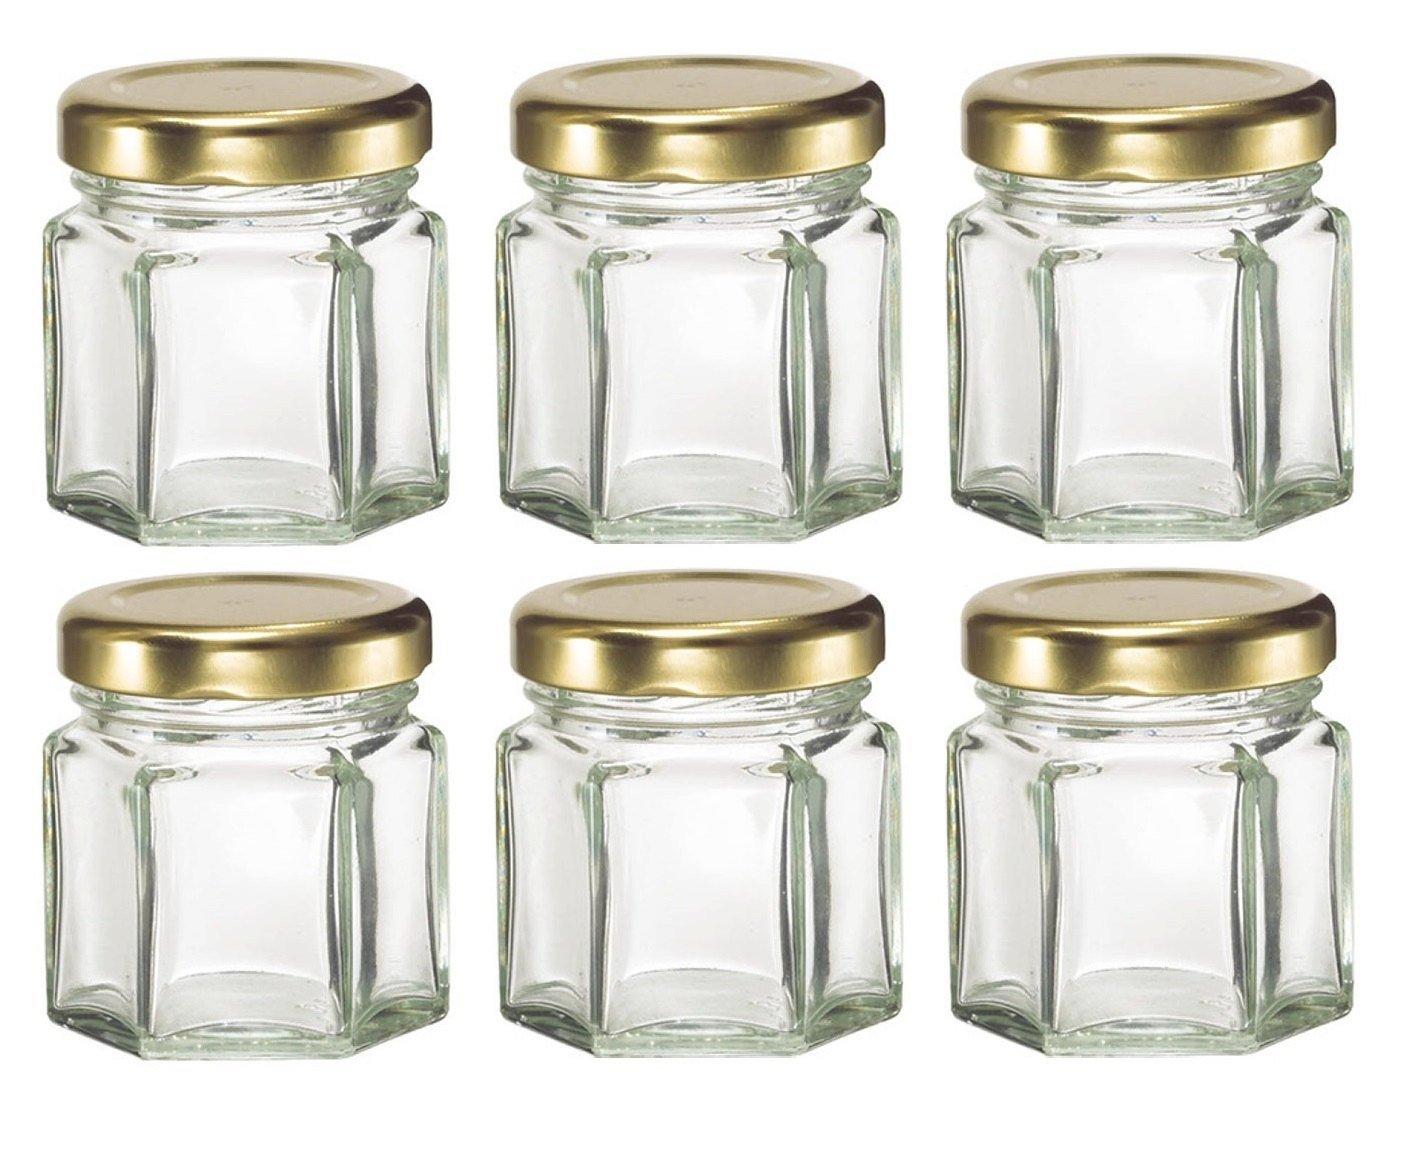 hexagon glass jars with lids for candles honey etc 1 1 2 oz 1 5 oz hex ebay. Black Bedroom Furniture Sets. Home Design Ideas